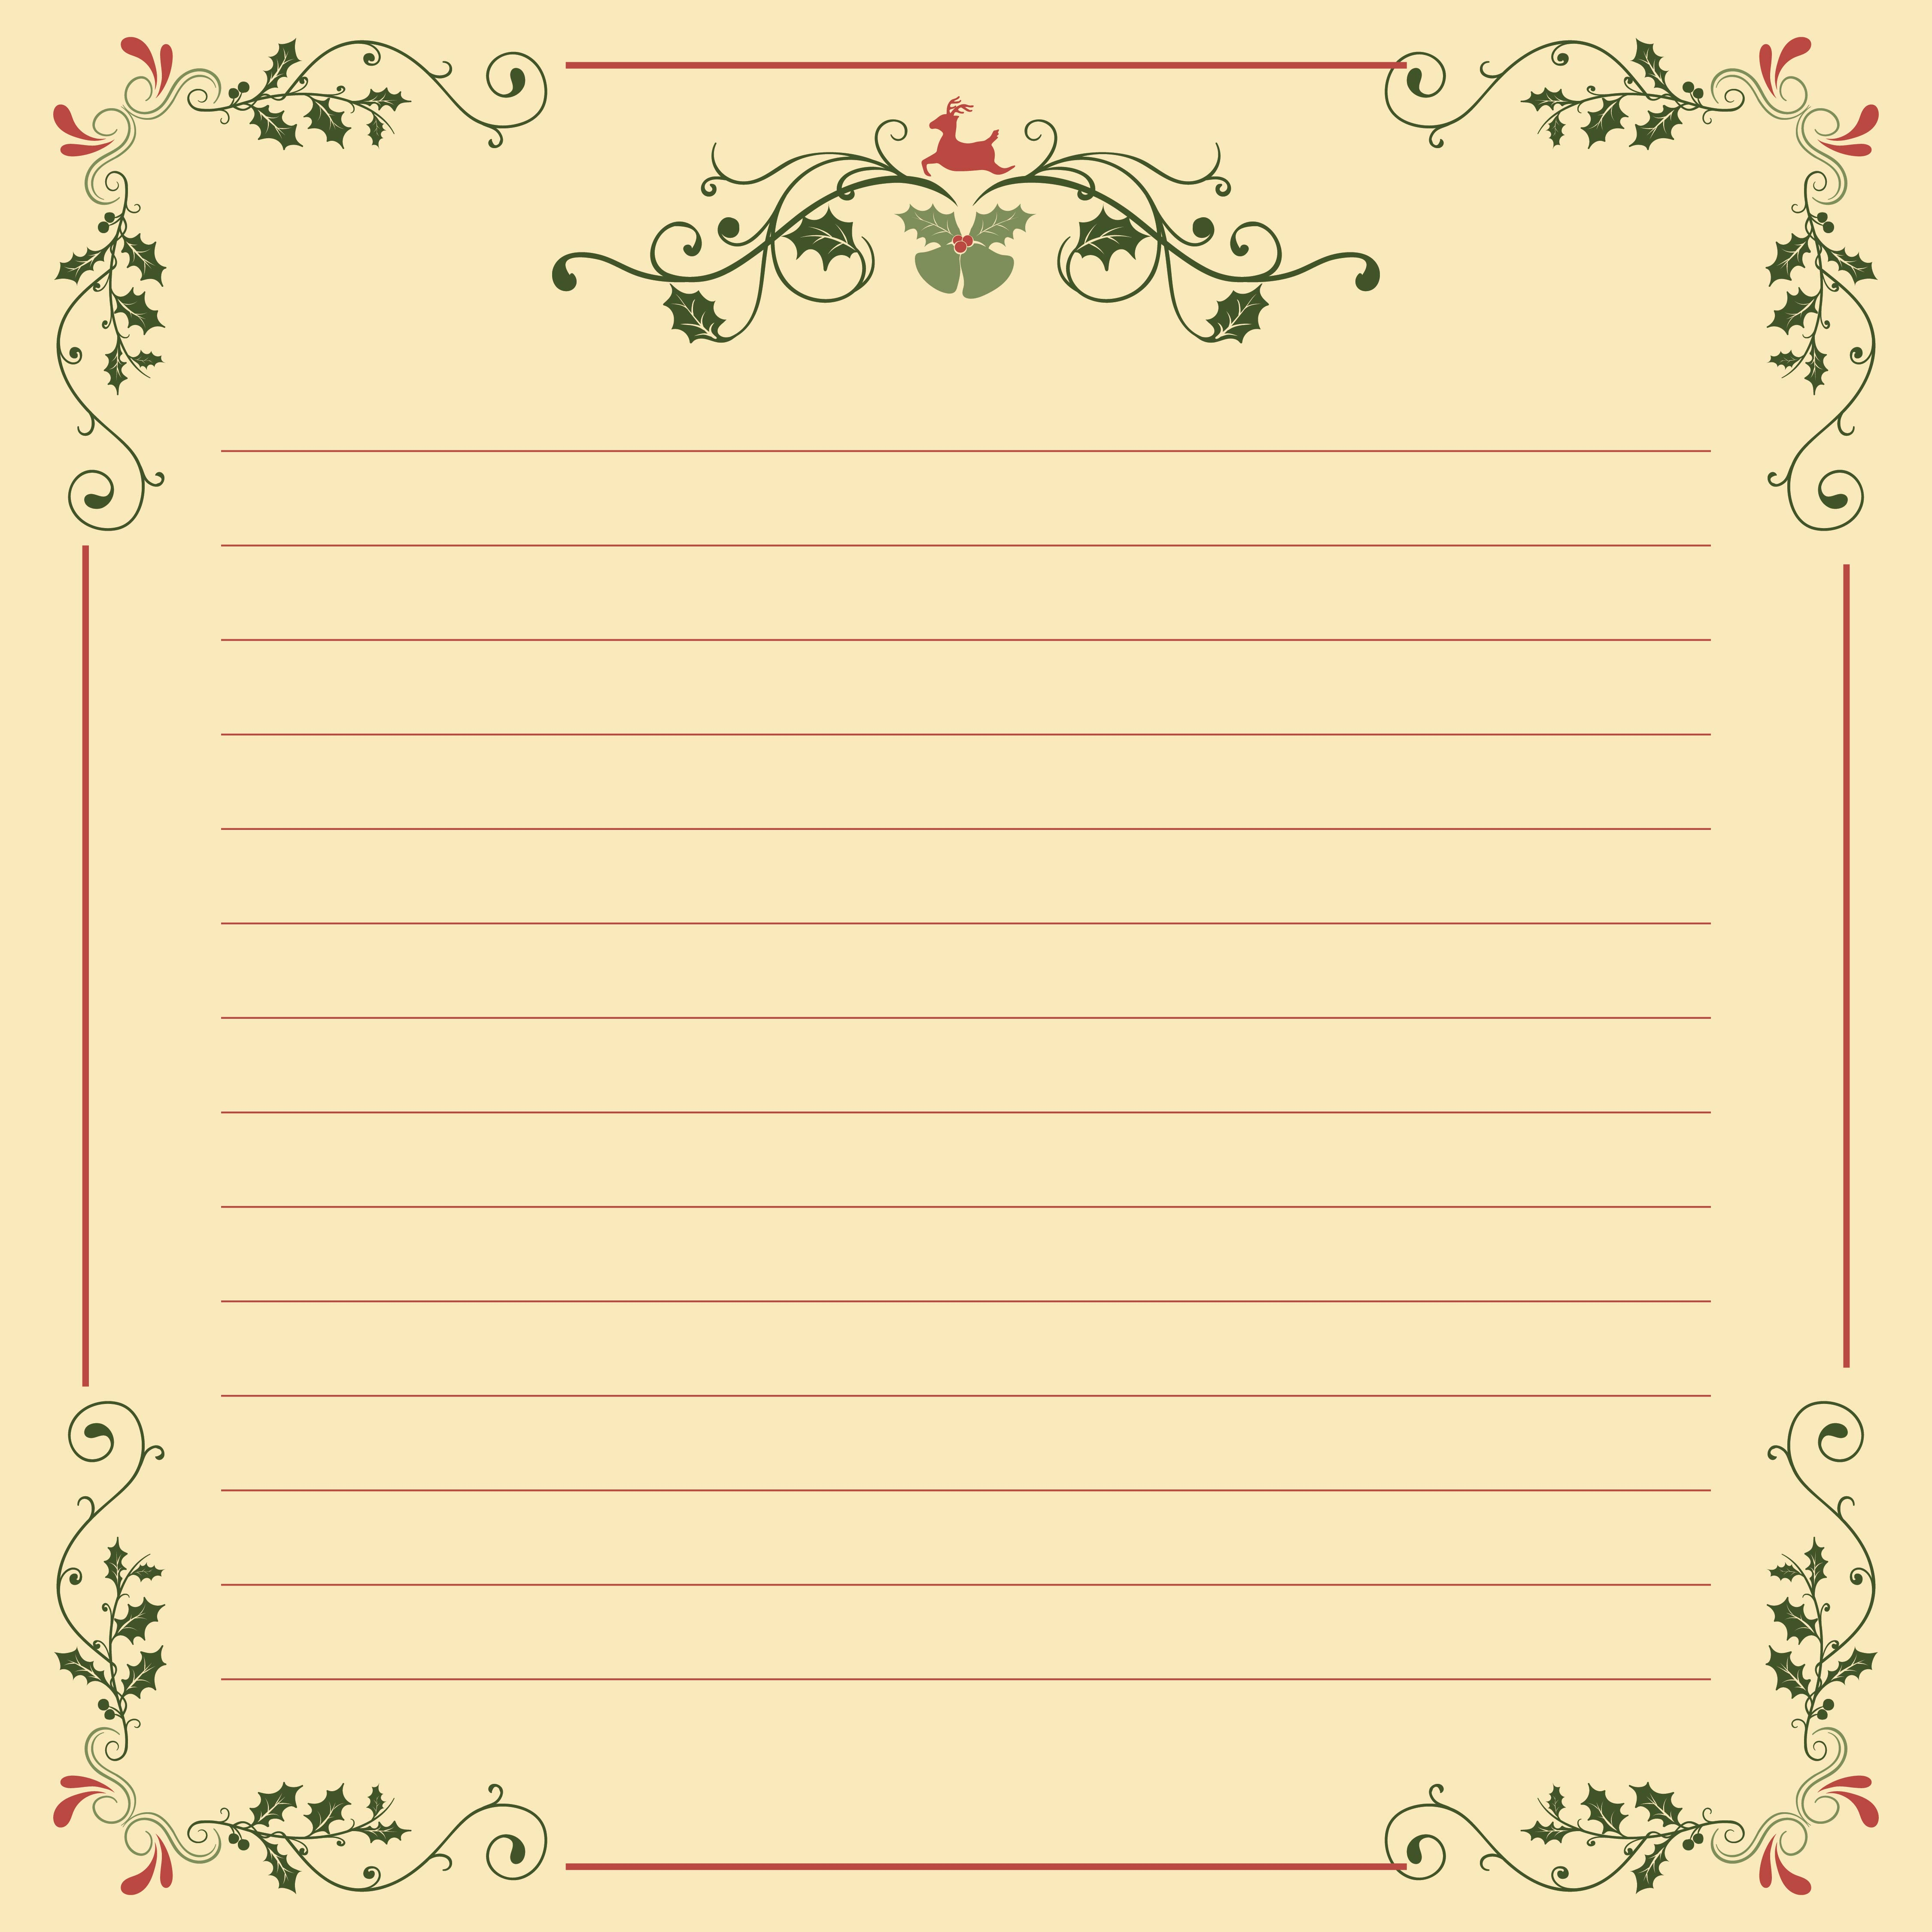 Printable Christmas Stationery Templates